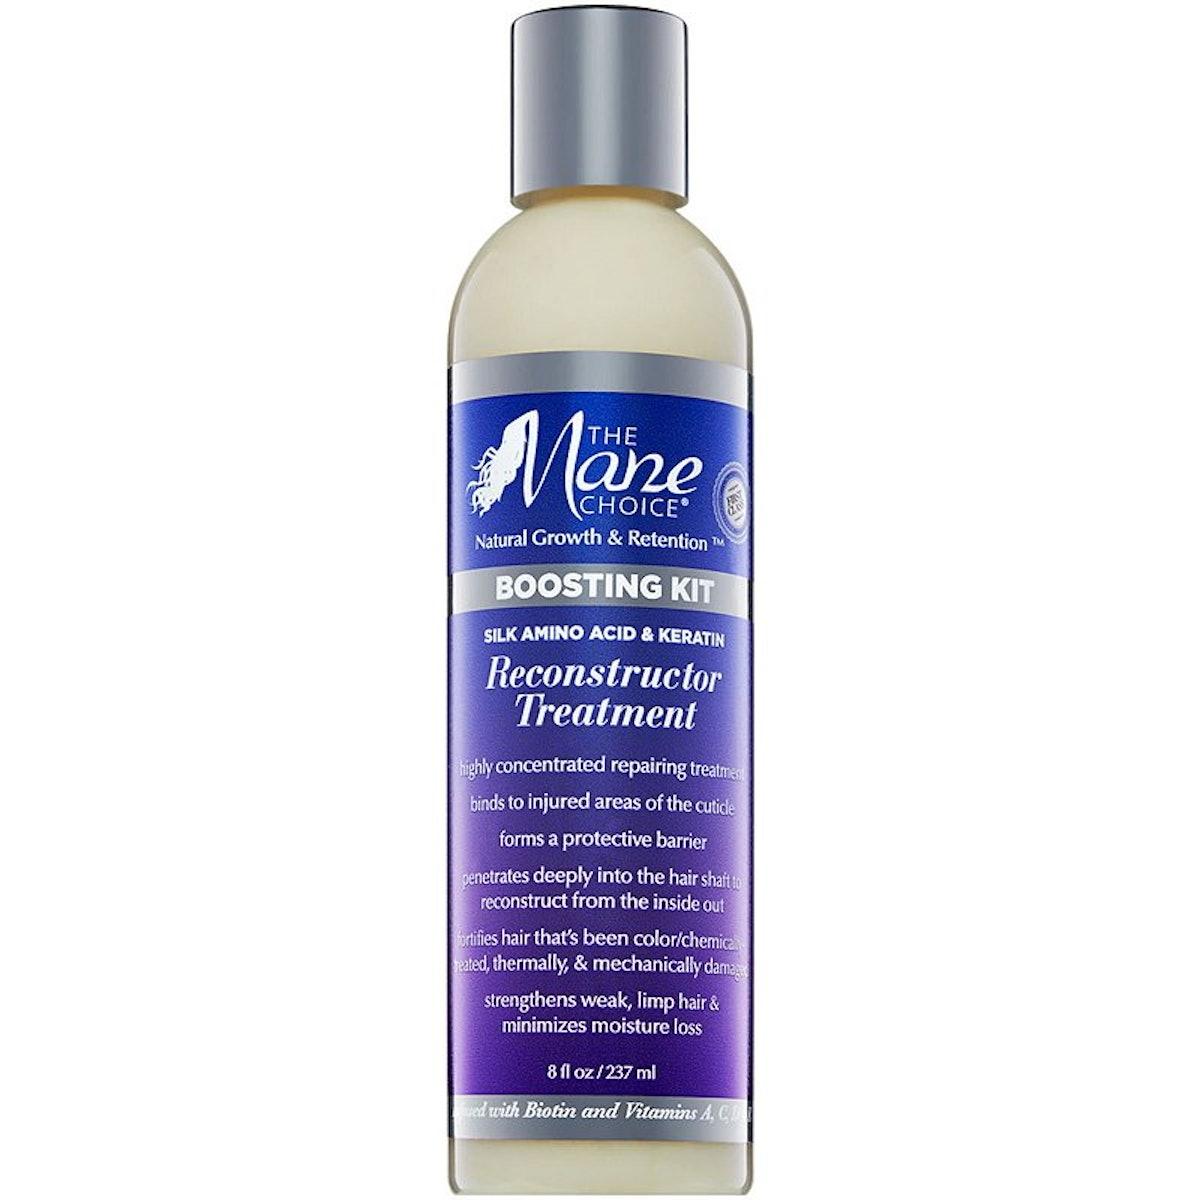 Boosting Kit Silk Amino Acid & Keratin Reconstructor Treatment